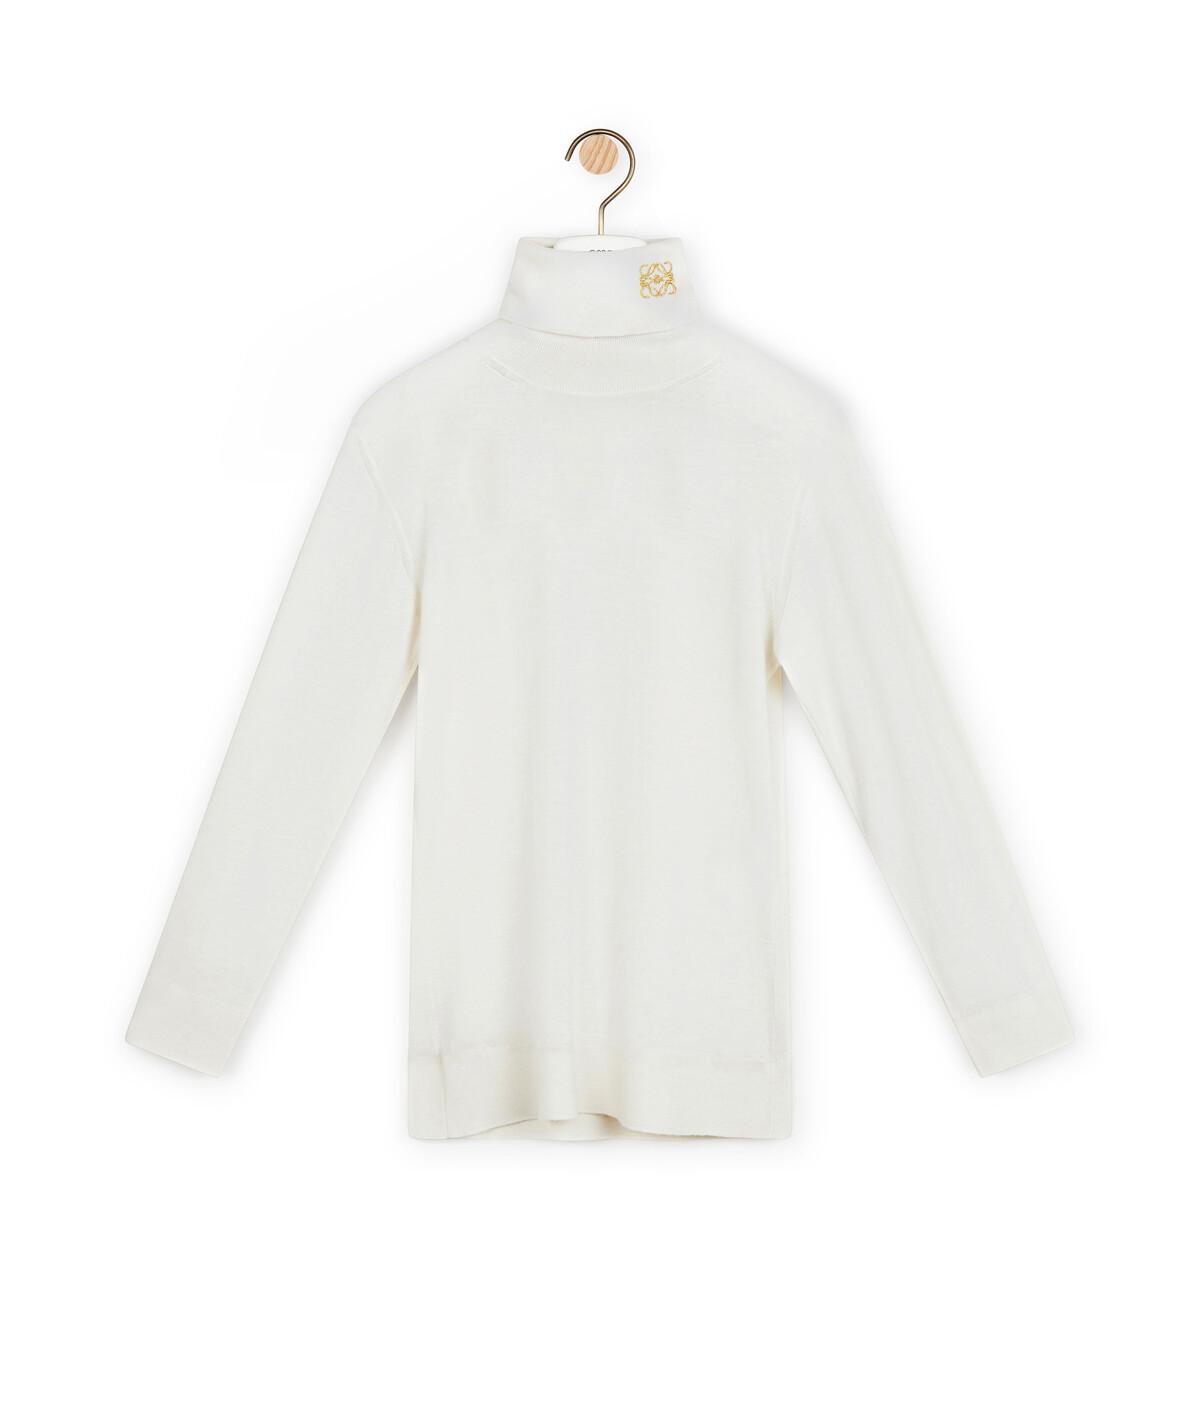 LOEWE Anagram Turtleneck Sweater Ecru front